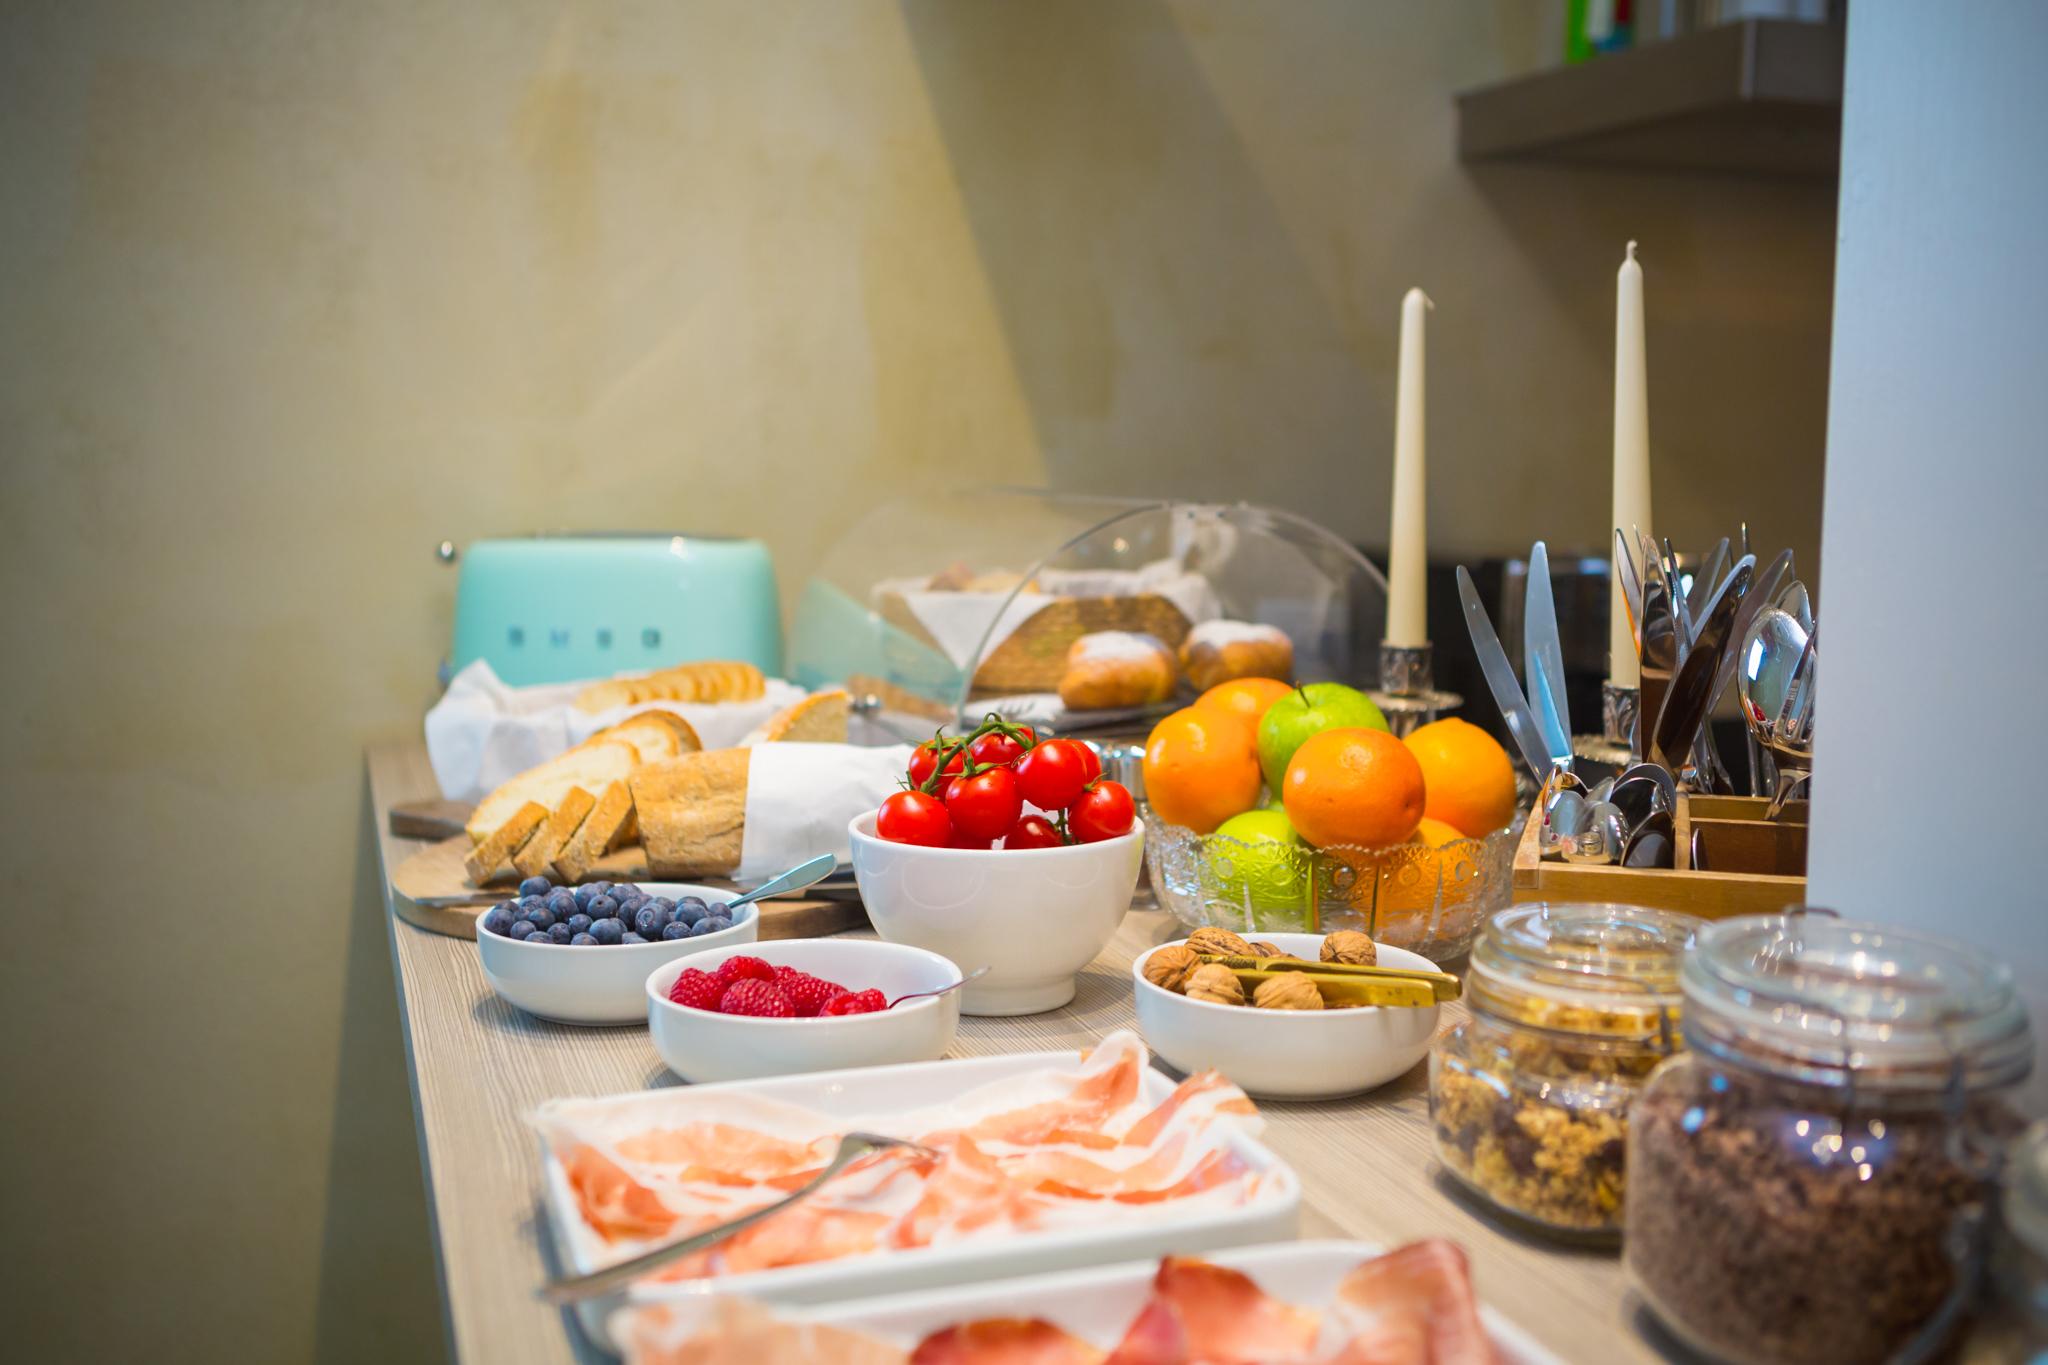 colazione, frutta, buffet, salute, r